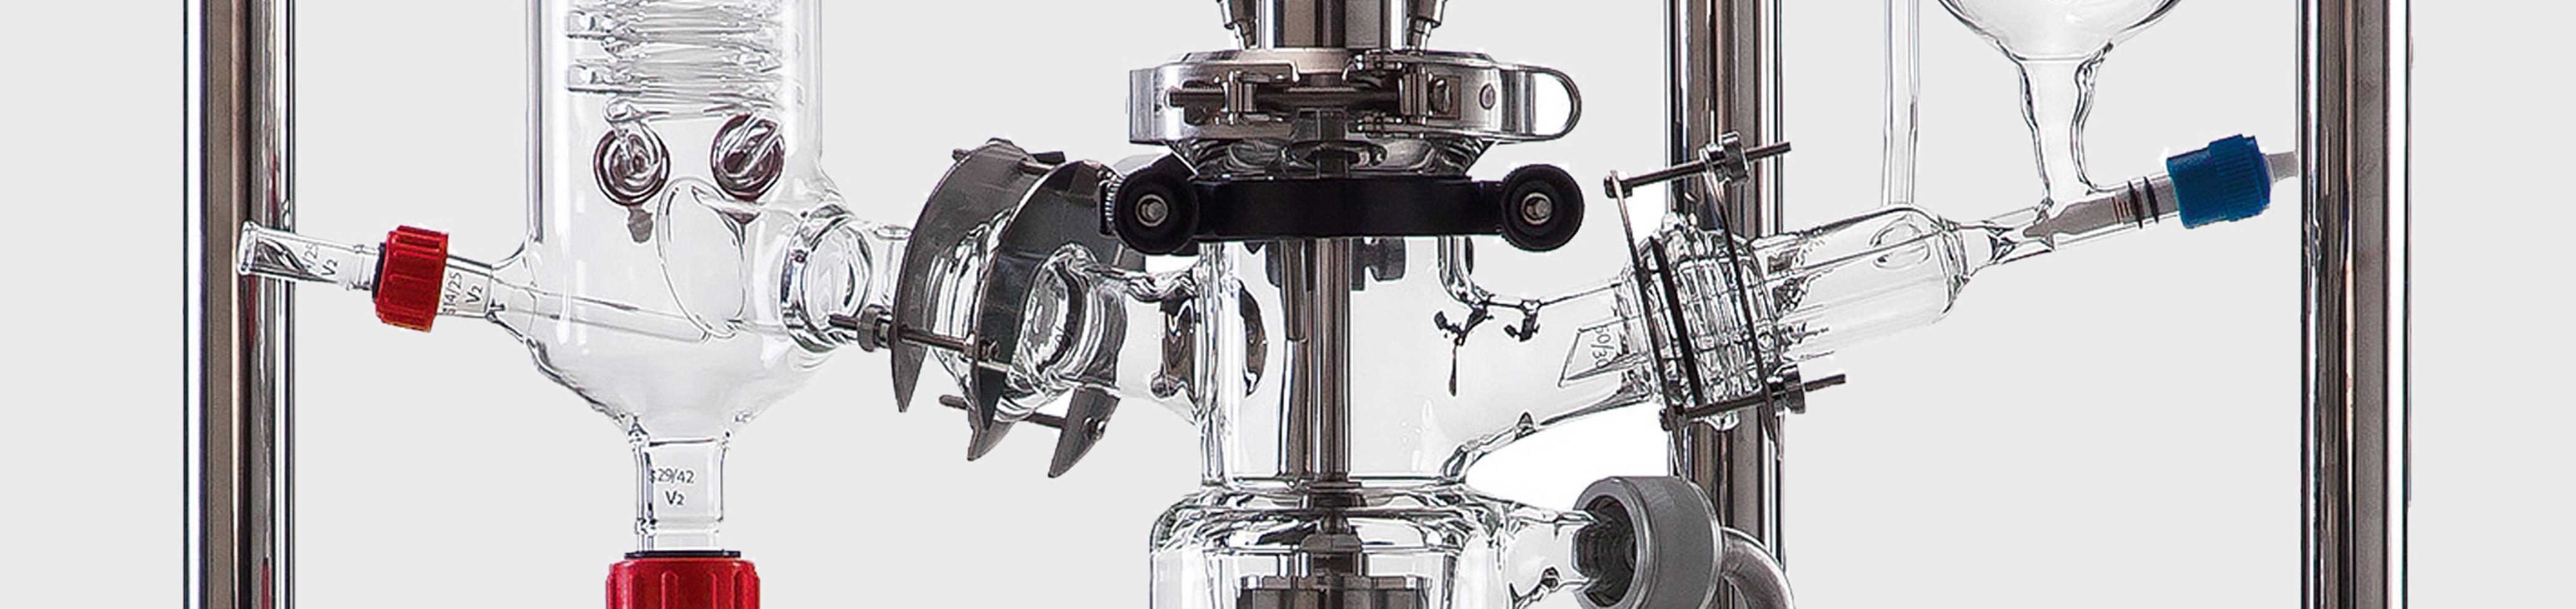 AGI Glassplant Thin Film Evaporator